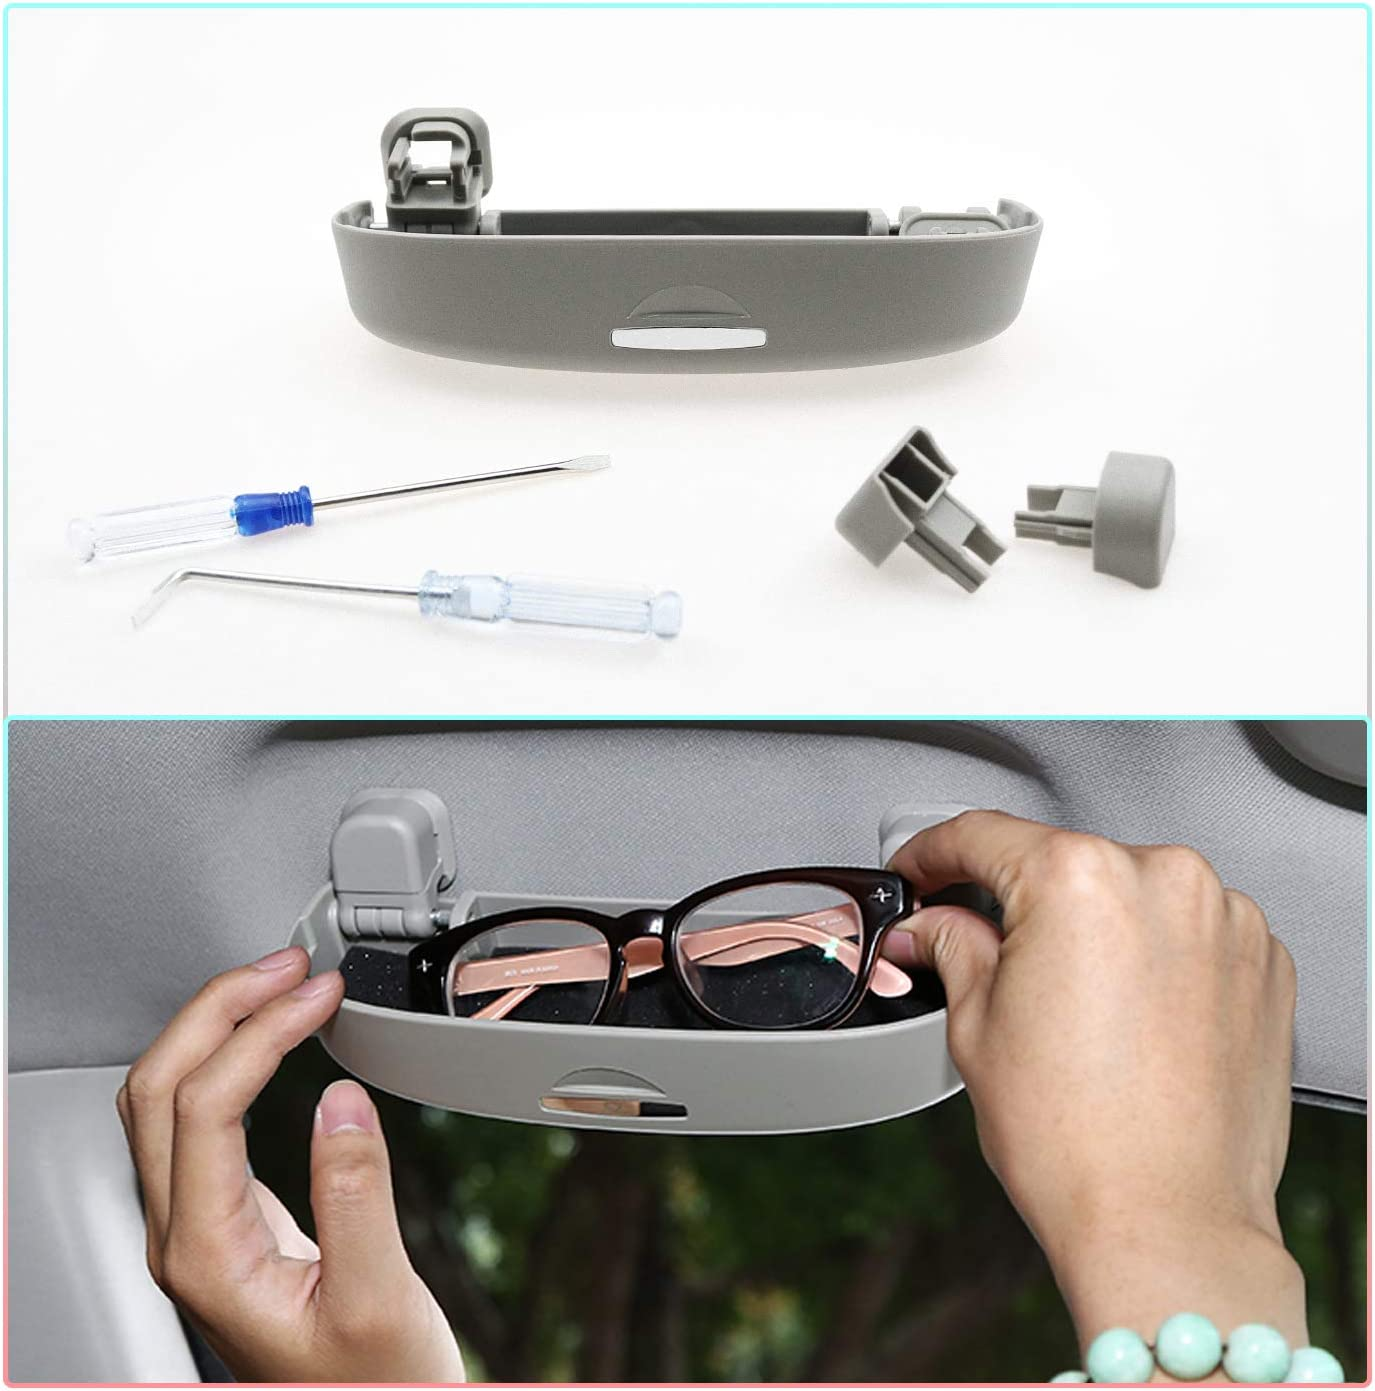 Black CDEFG Car Sunglasses Storage Box Glasses Holder Eyeglasses Storage Case for 2018-2019 C-HR CHR